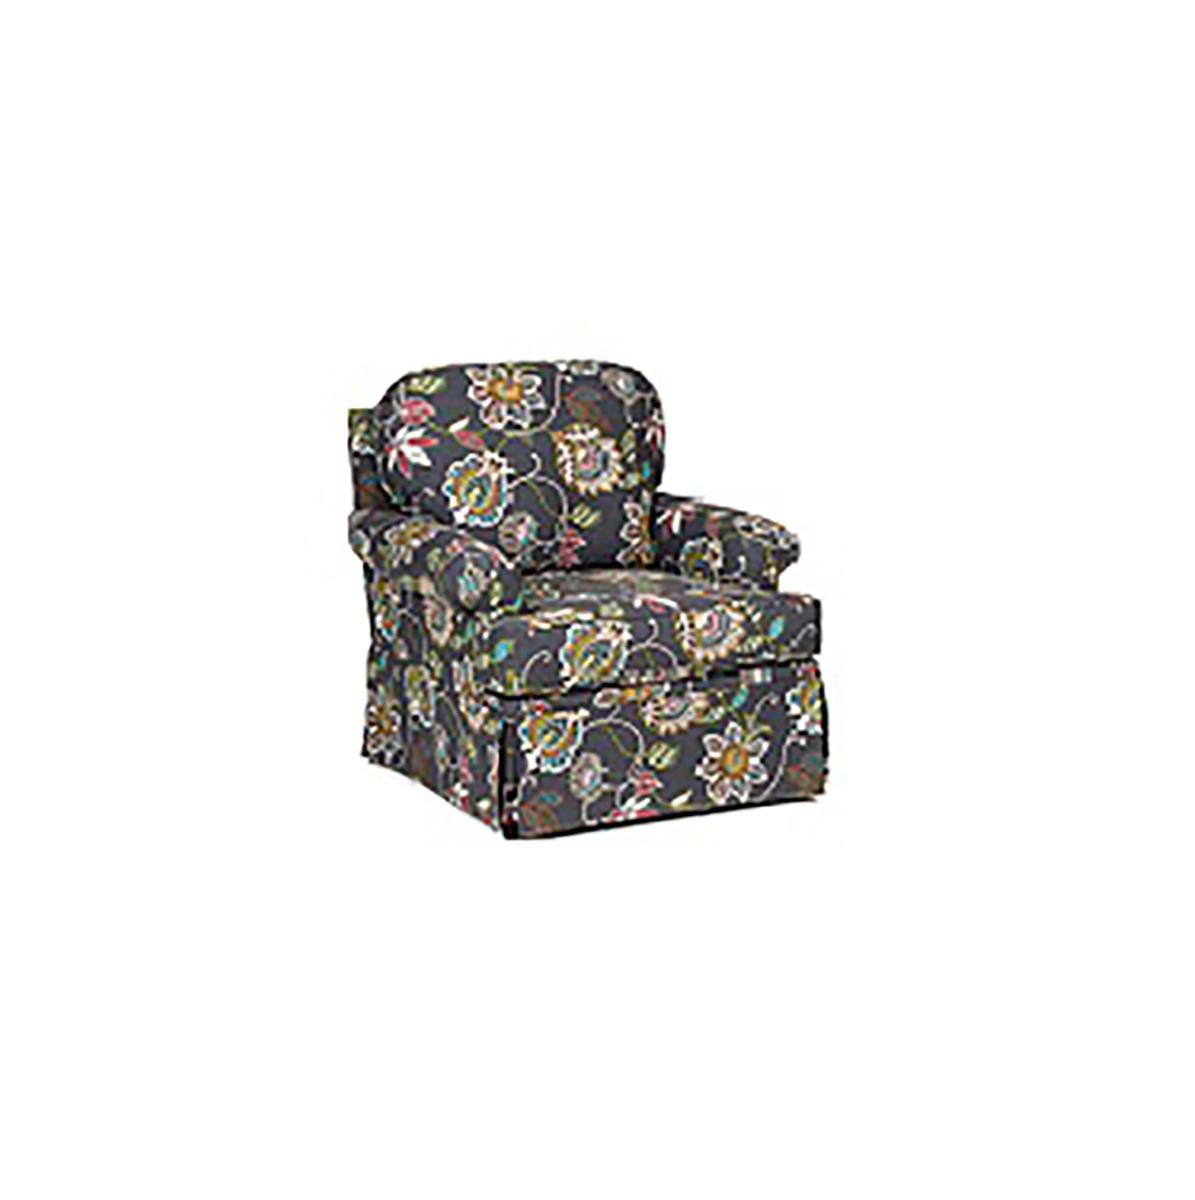 Chelsea Home Groton Chair - Multicolor